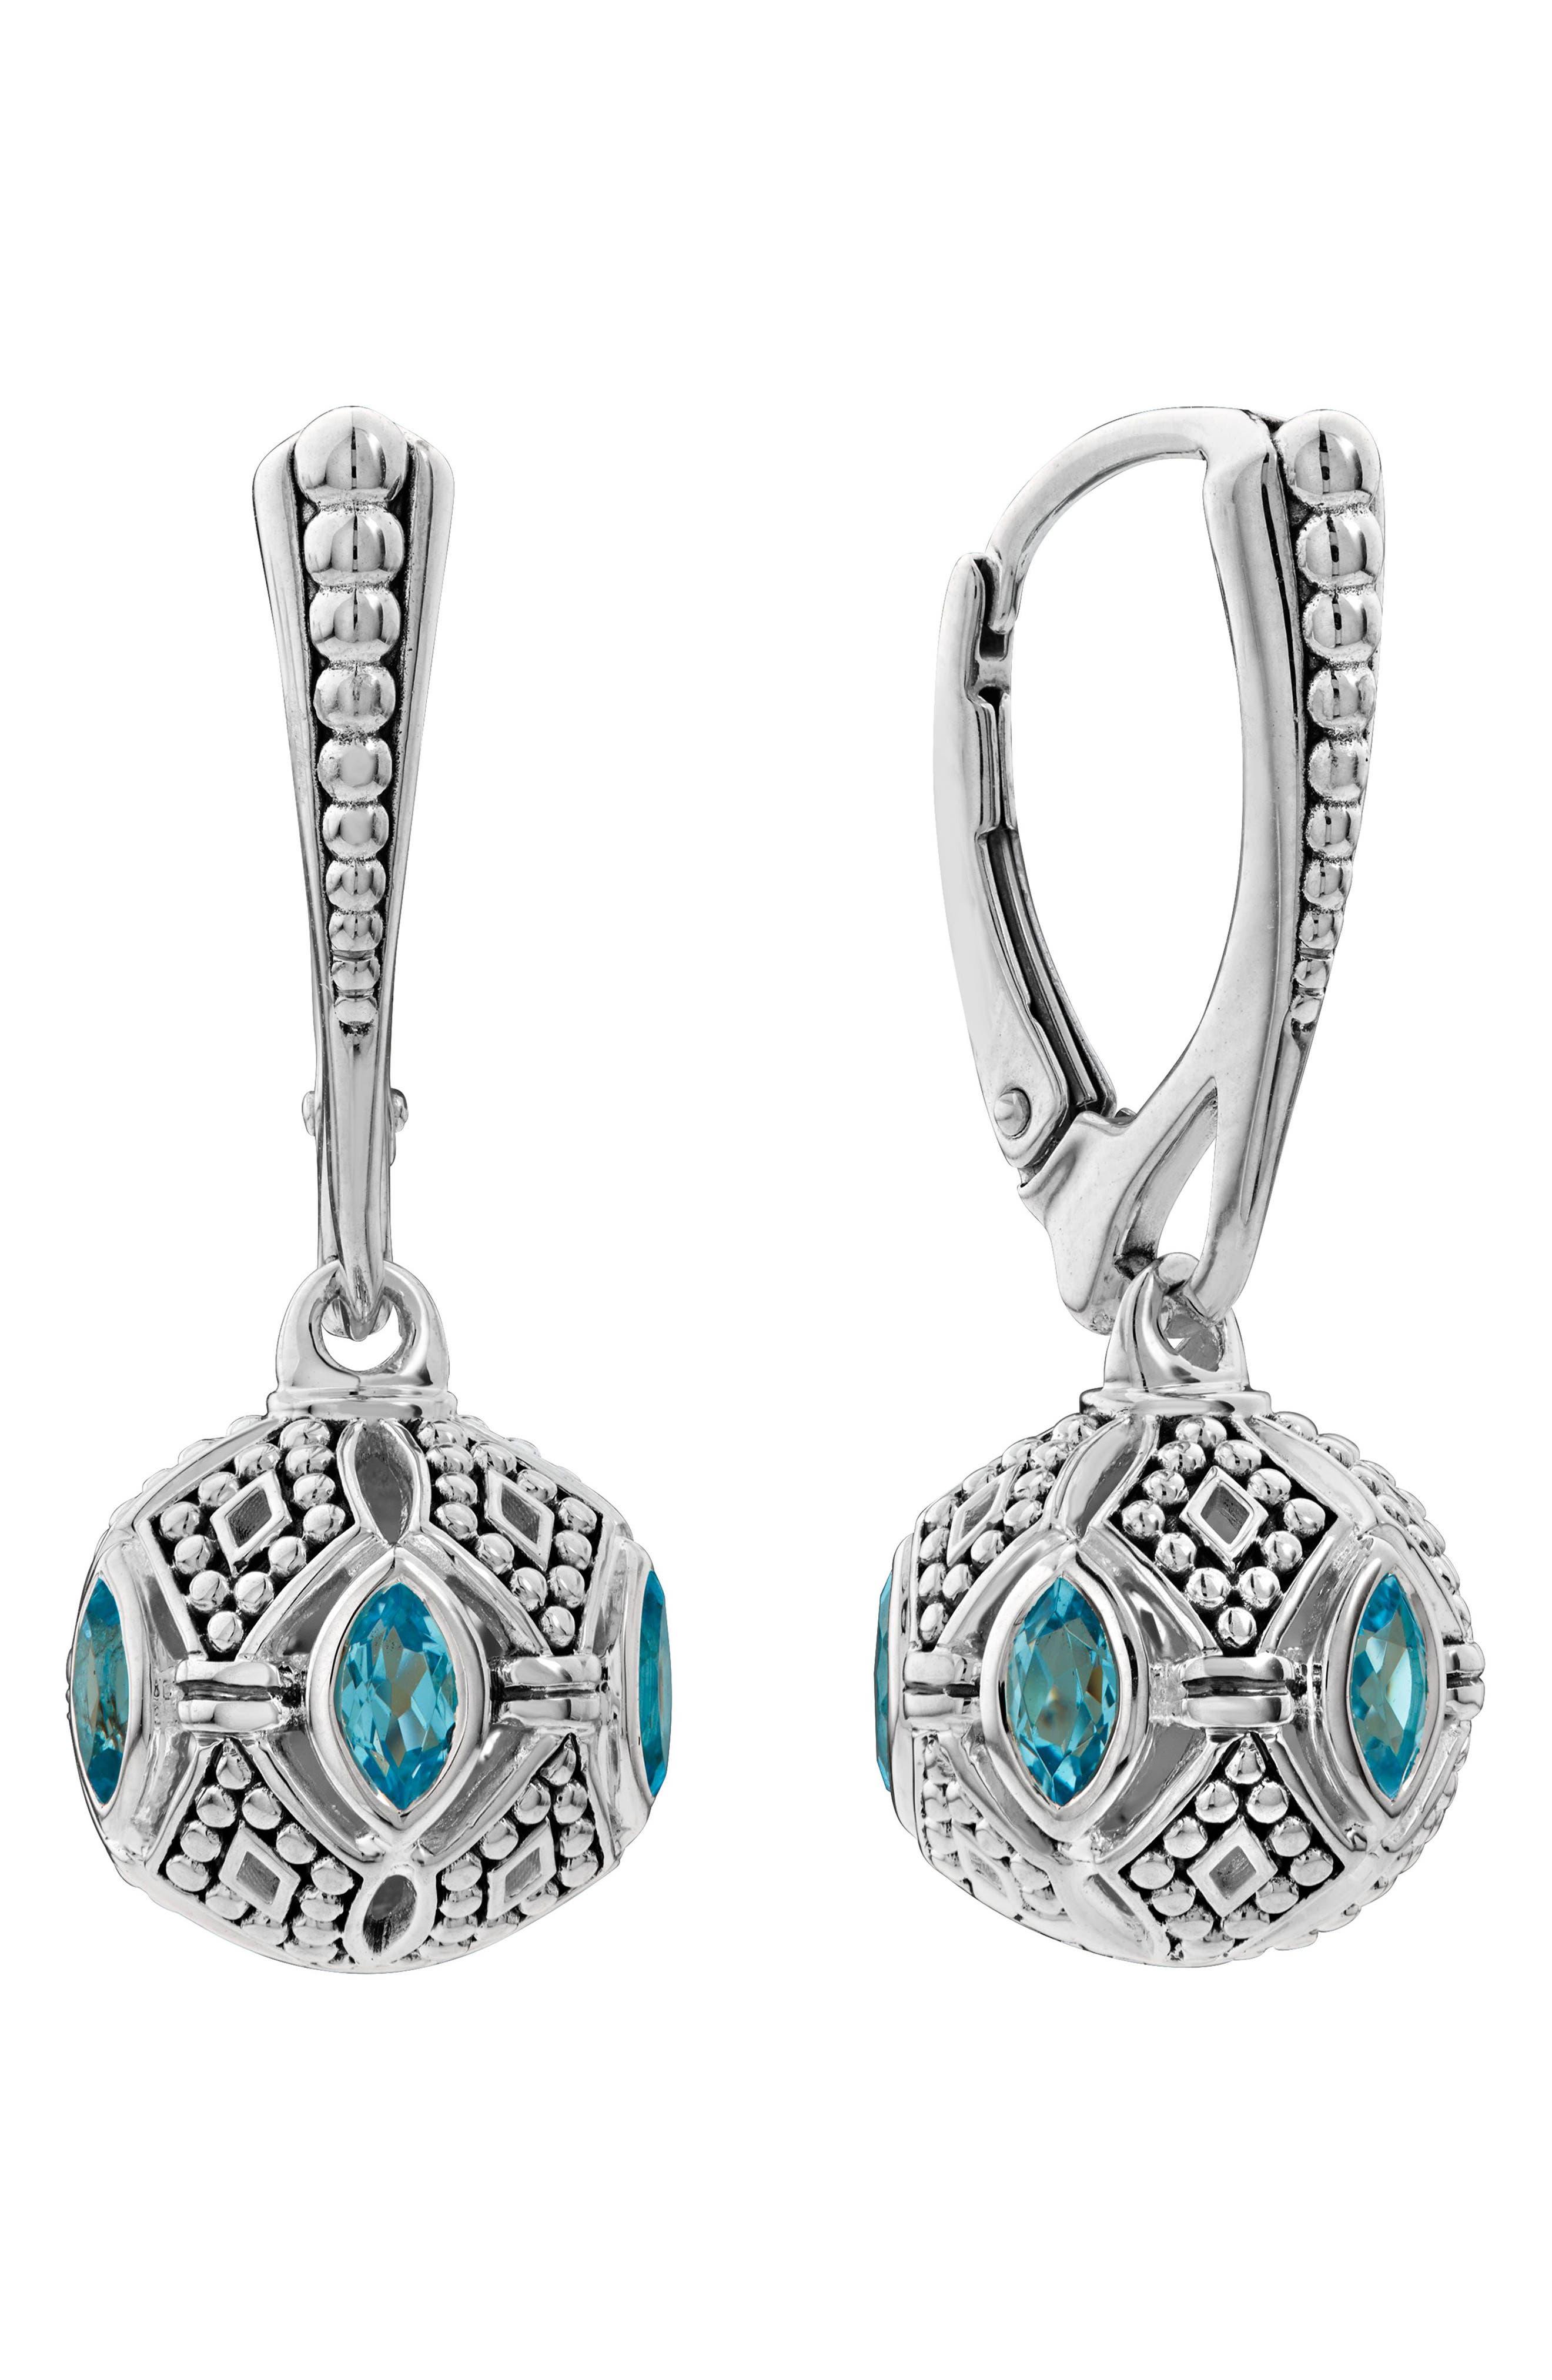 Caviar Talisman Marquee Leverback Earrings,                             Main thumbnail 1, color,                             SILVER/ 18K GOLD/ BLUE TOPAZ